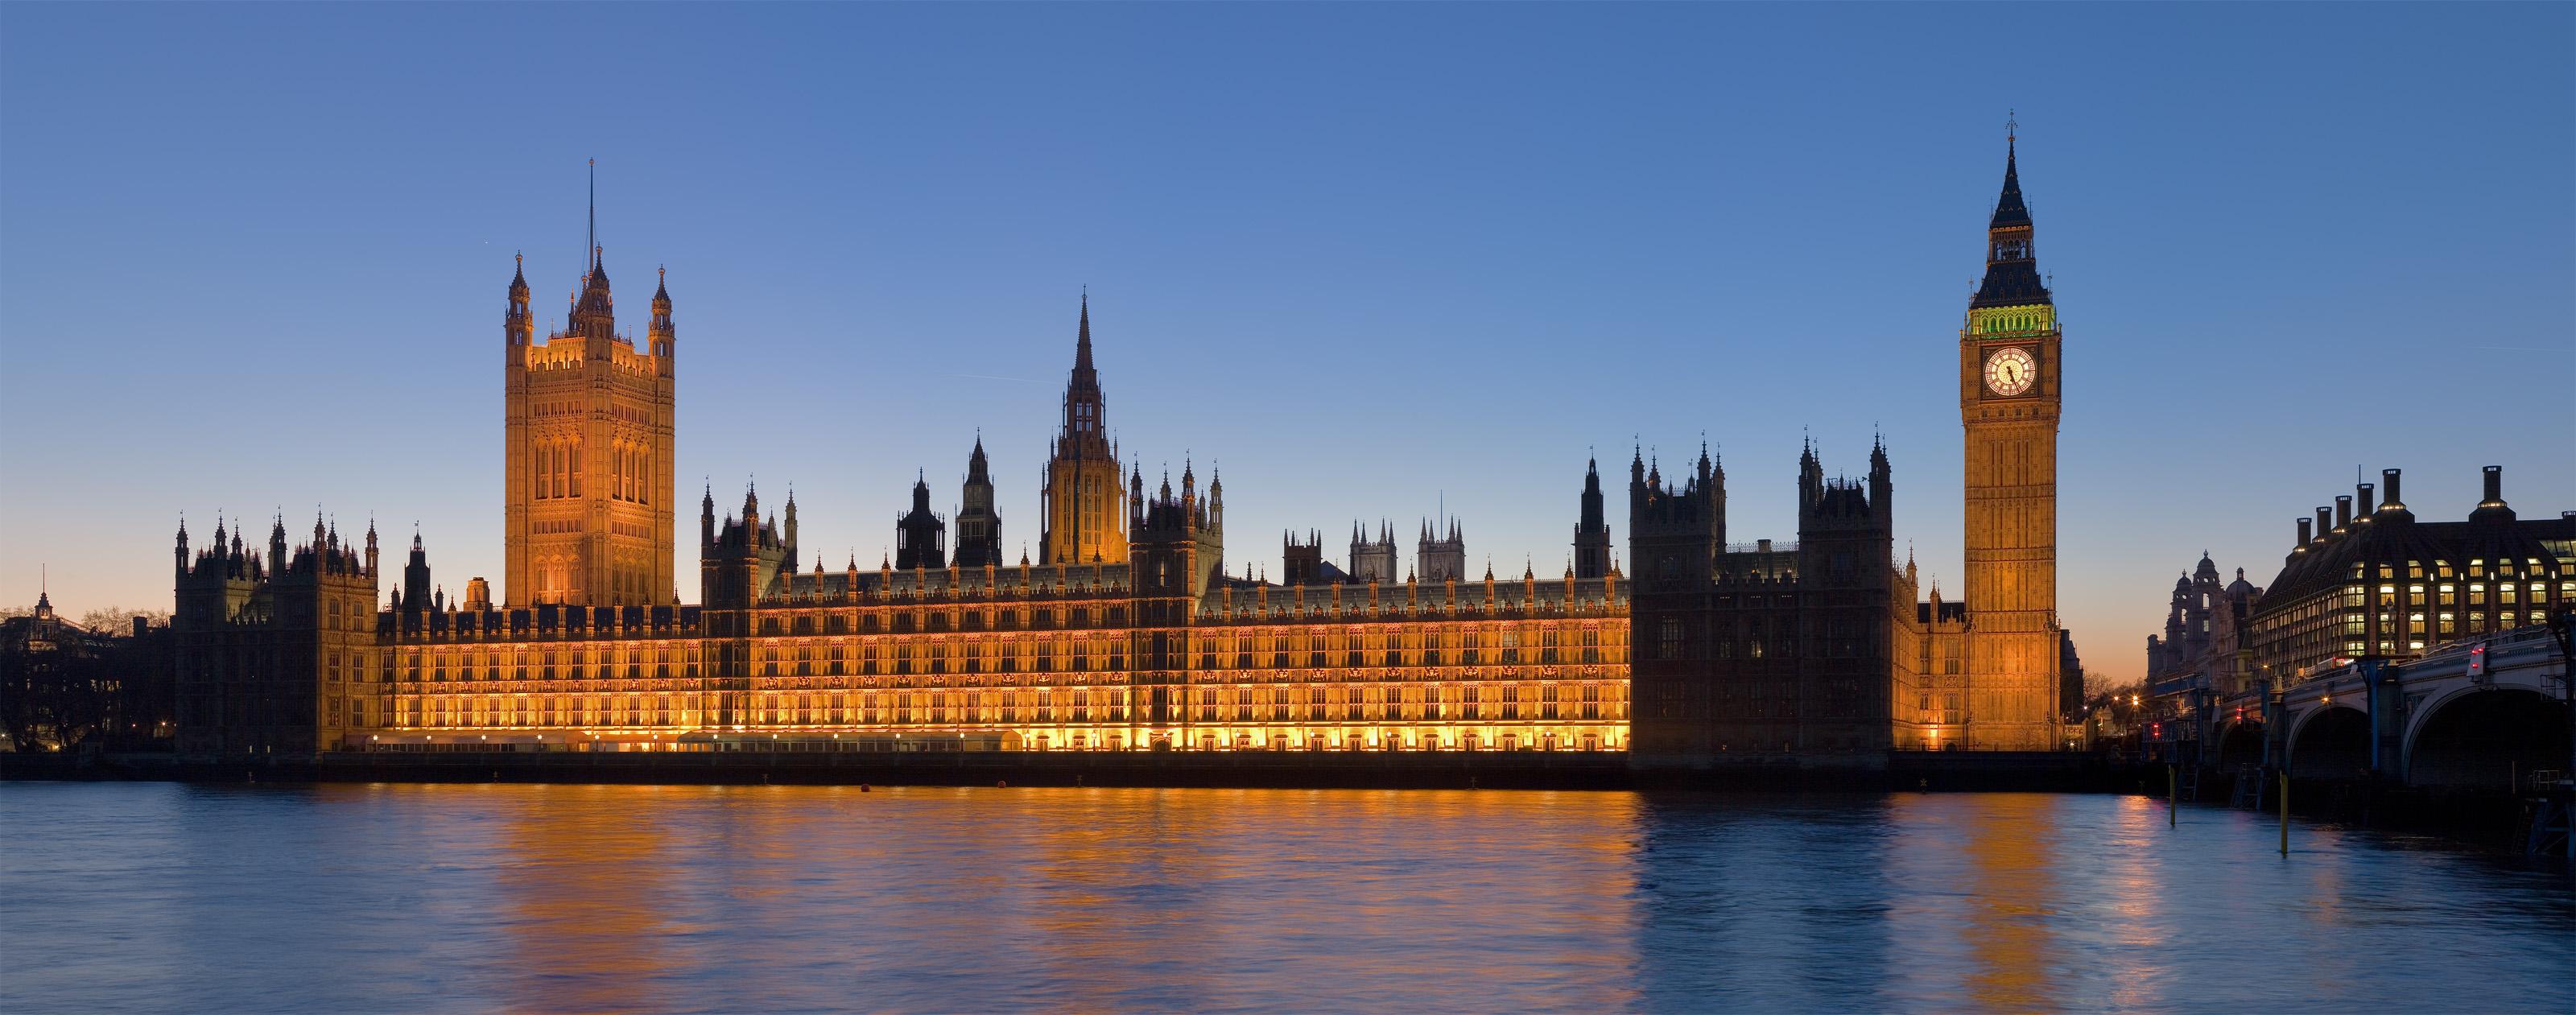 Palace_of_Westminster__London_-_Feb_2007.jpg